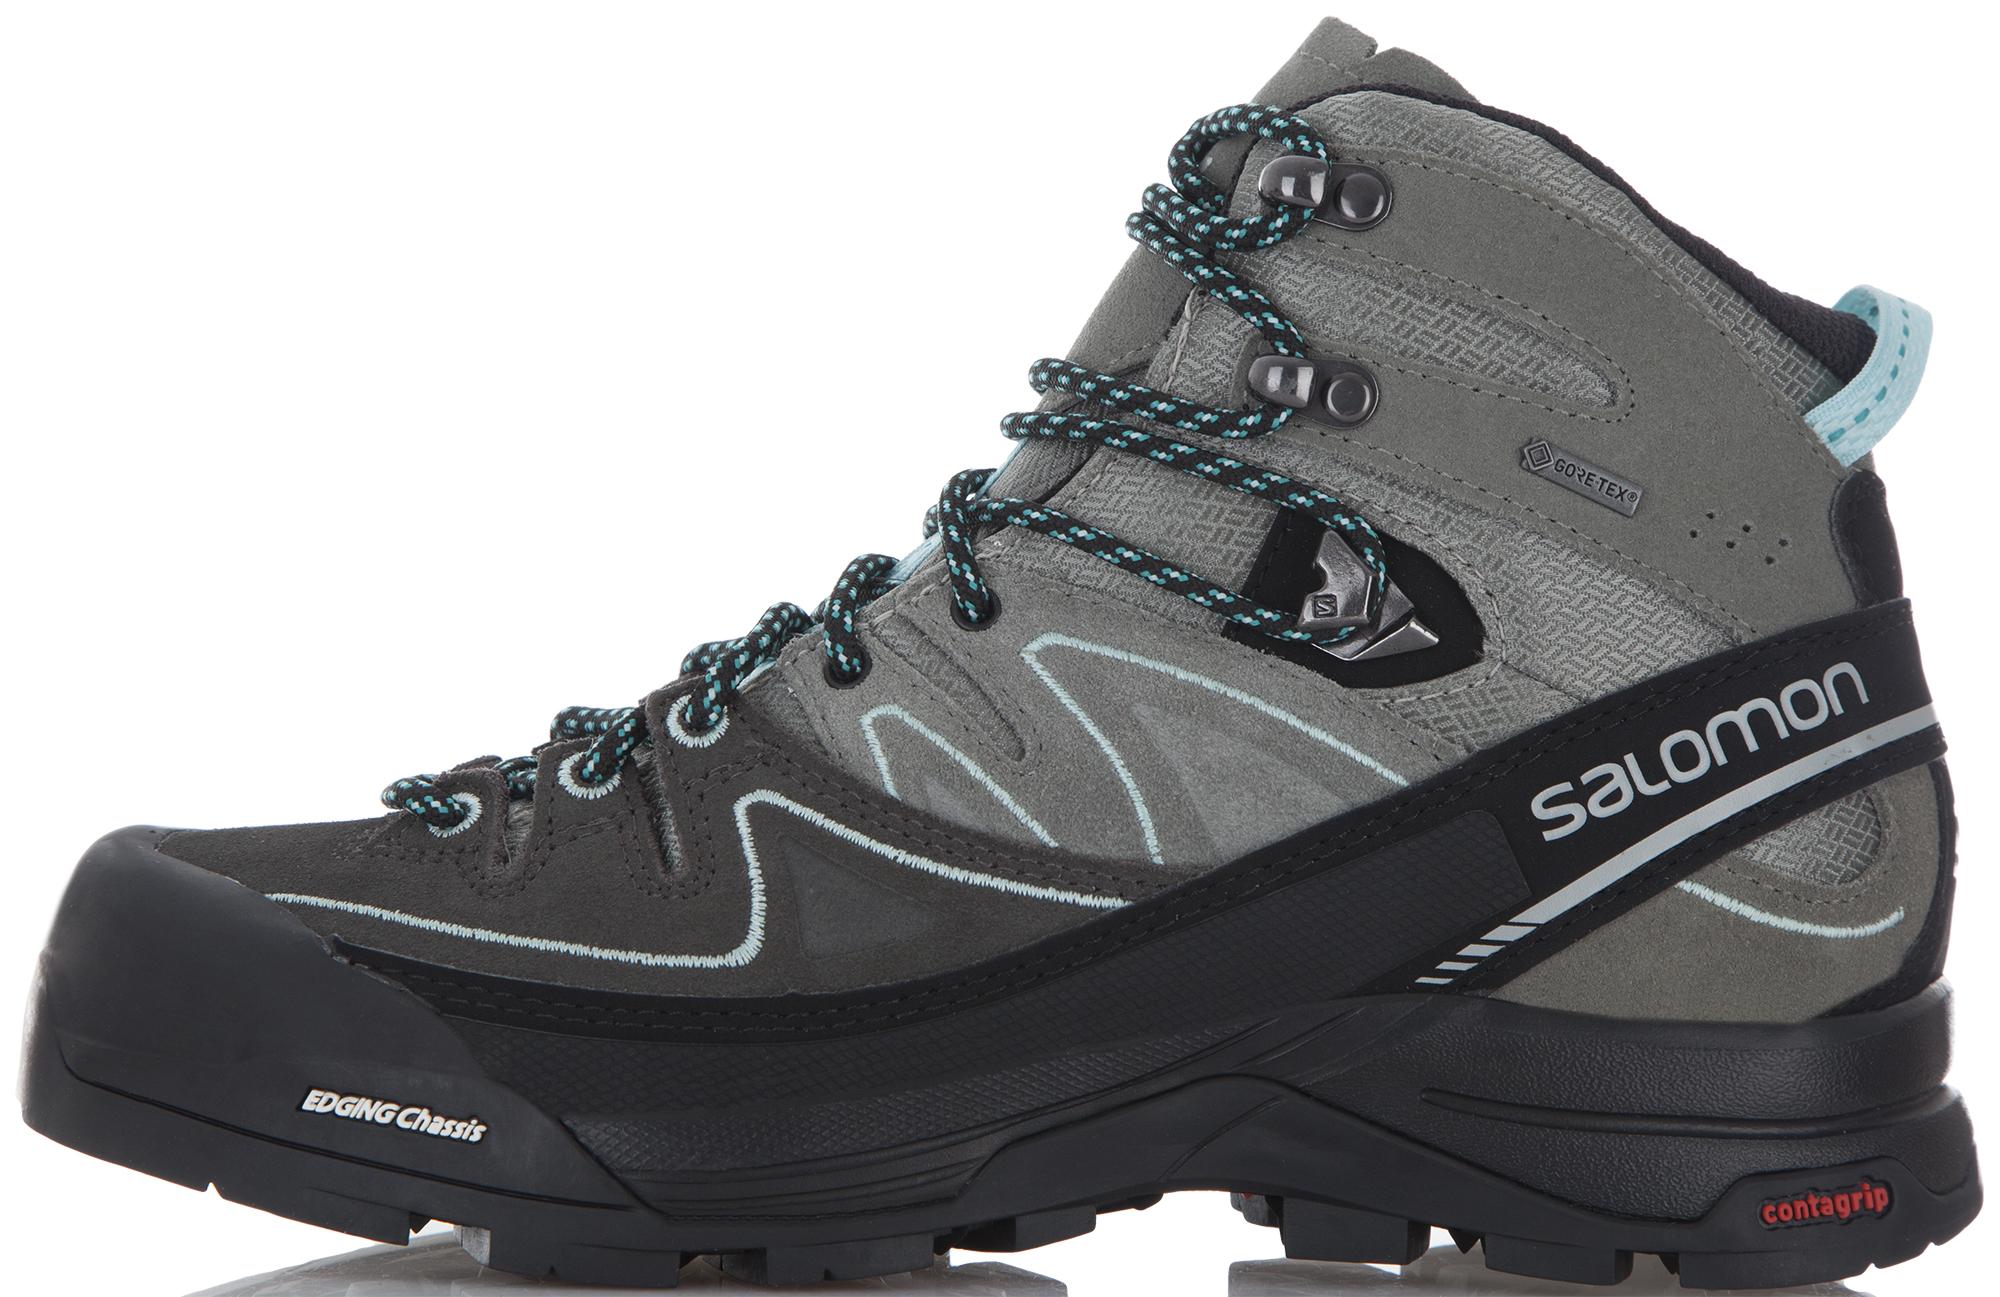 Salomon Ботинки женские Salomon X Alp Mid Ltr Gtx salomon ботинки мужские salomon x alp mid